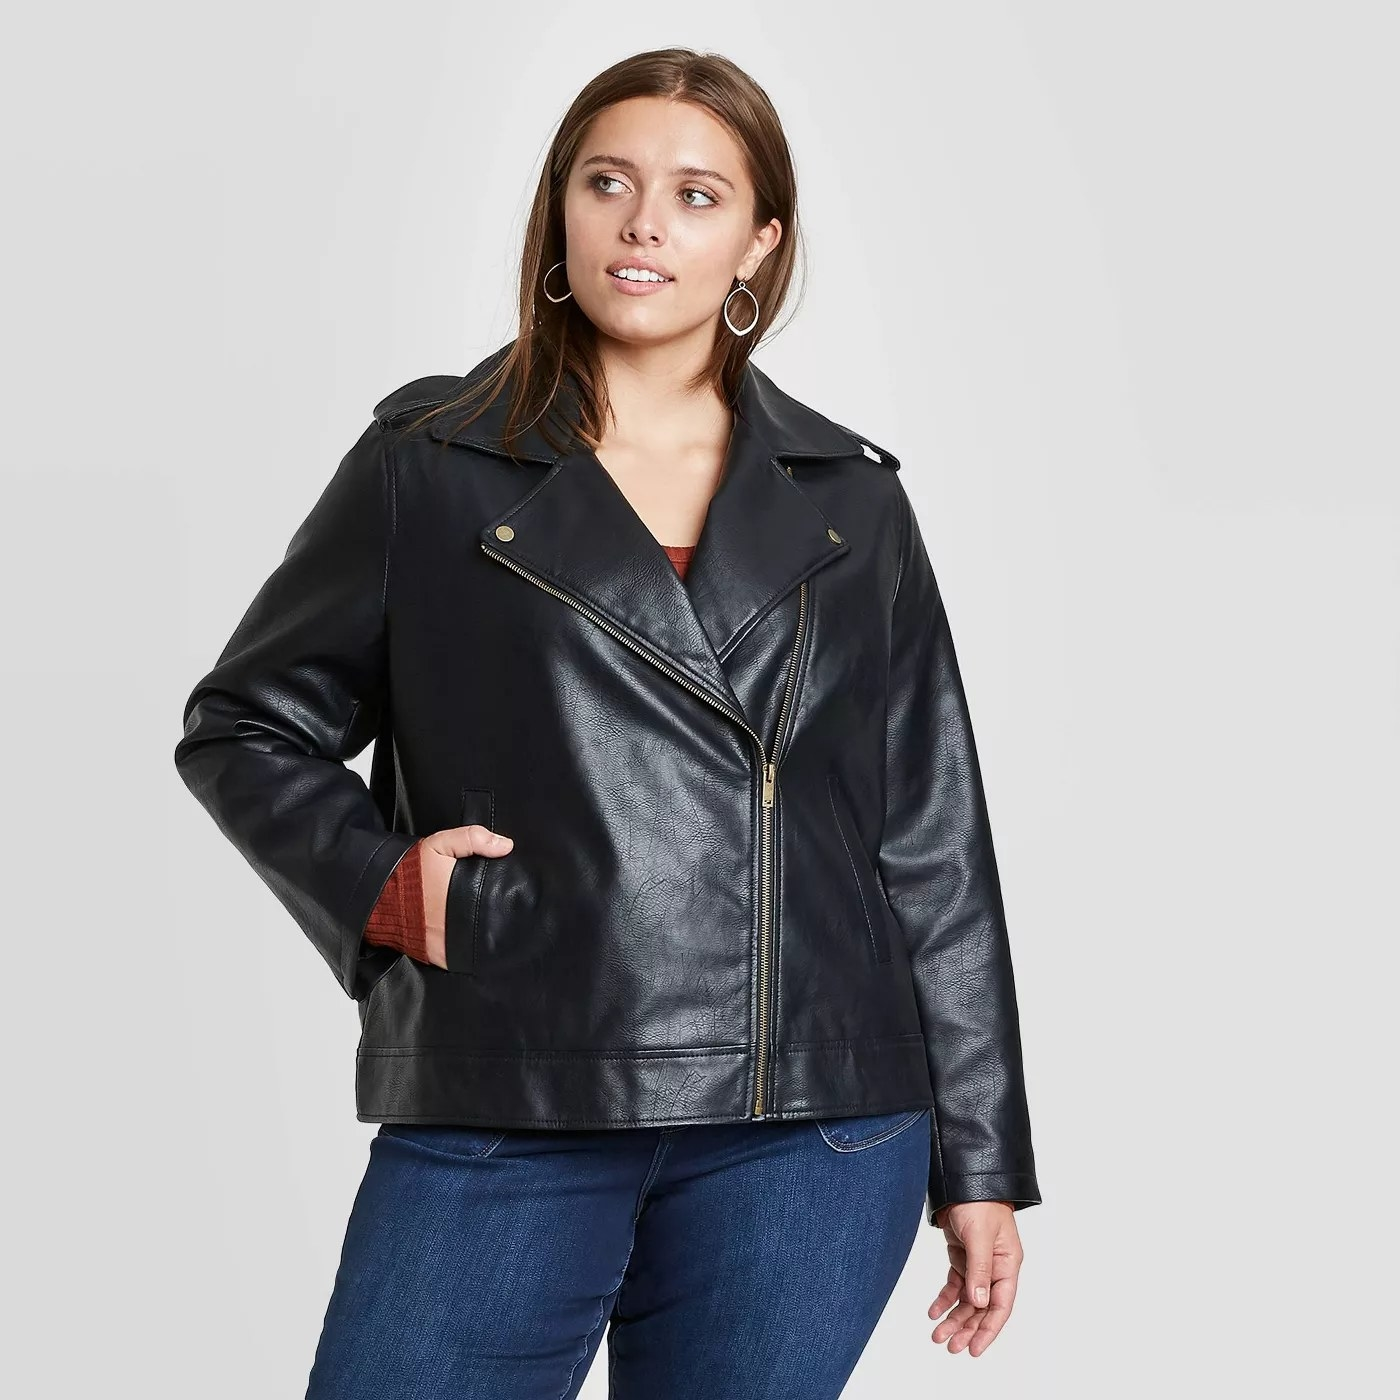 A model wearing a zipped up moto jacket